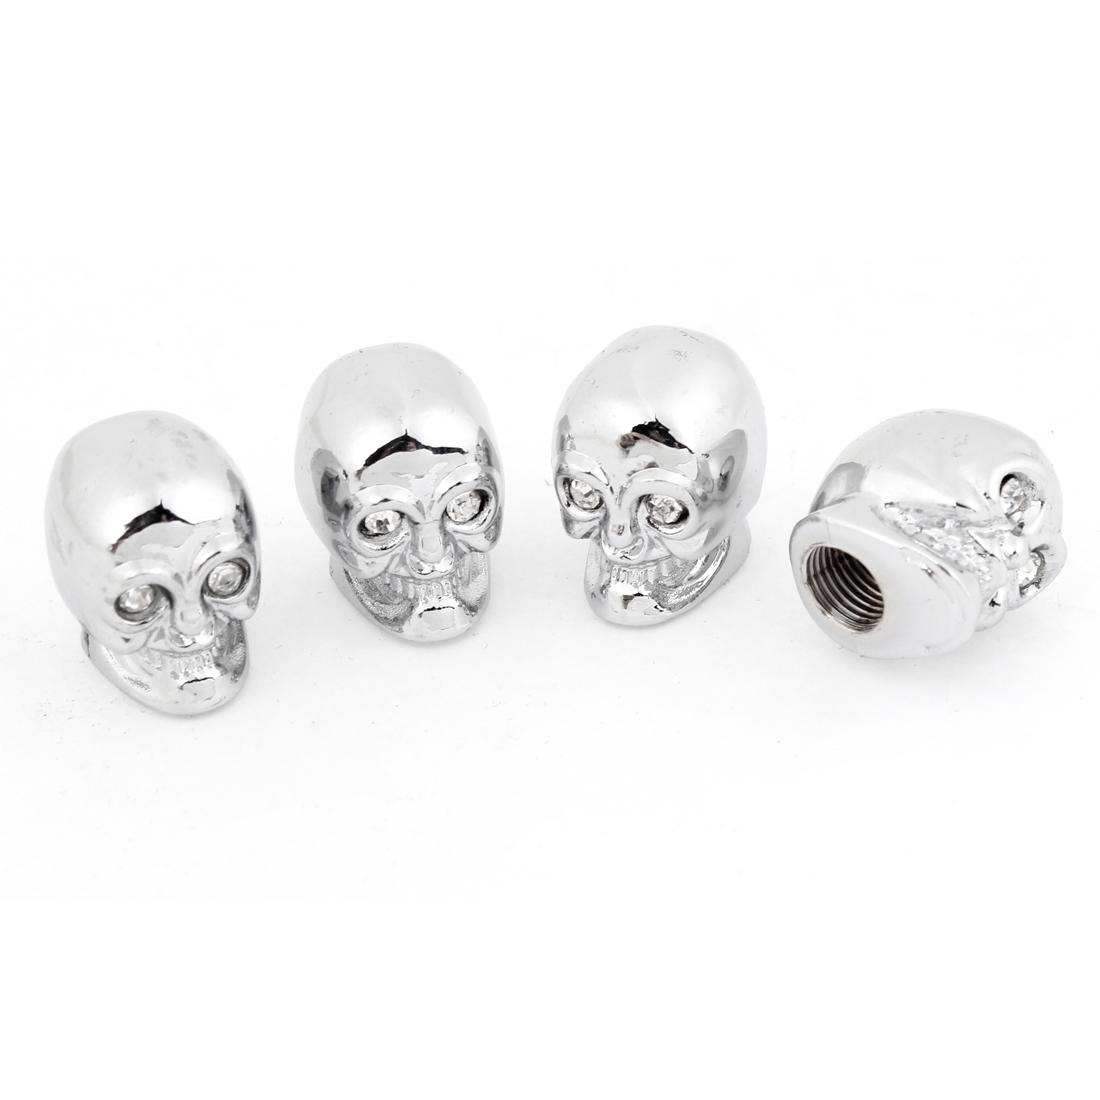 Car Metal Skull Head Shaped Tire Valve Stem Cap Cover Silver Tone Clear x 4